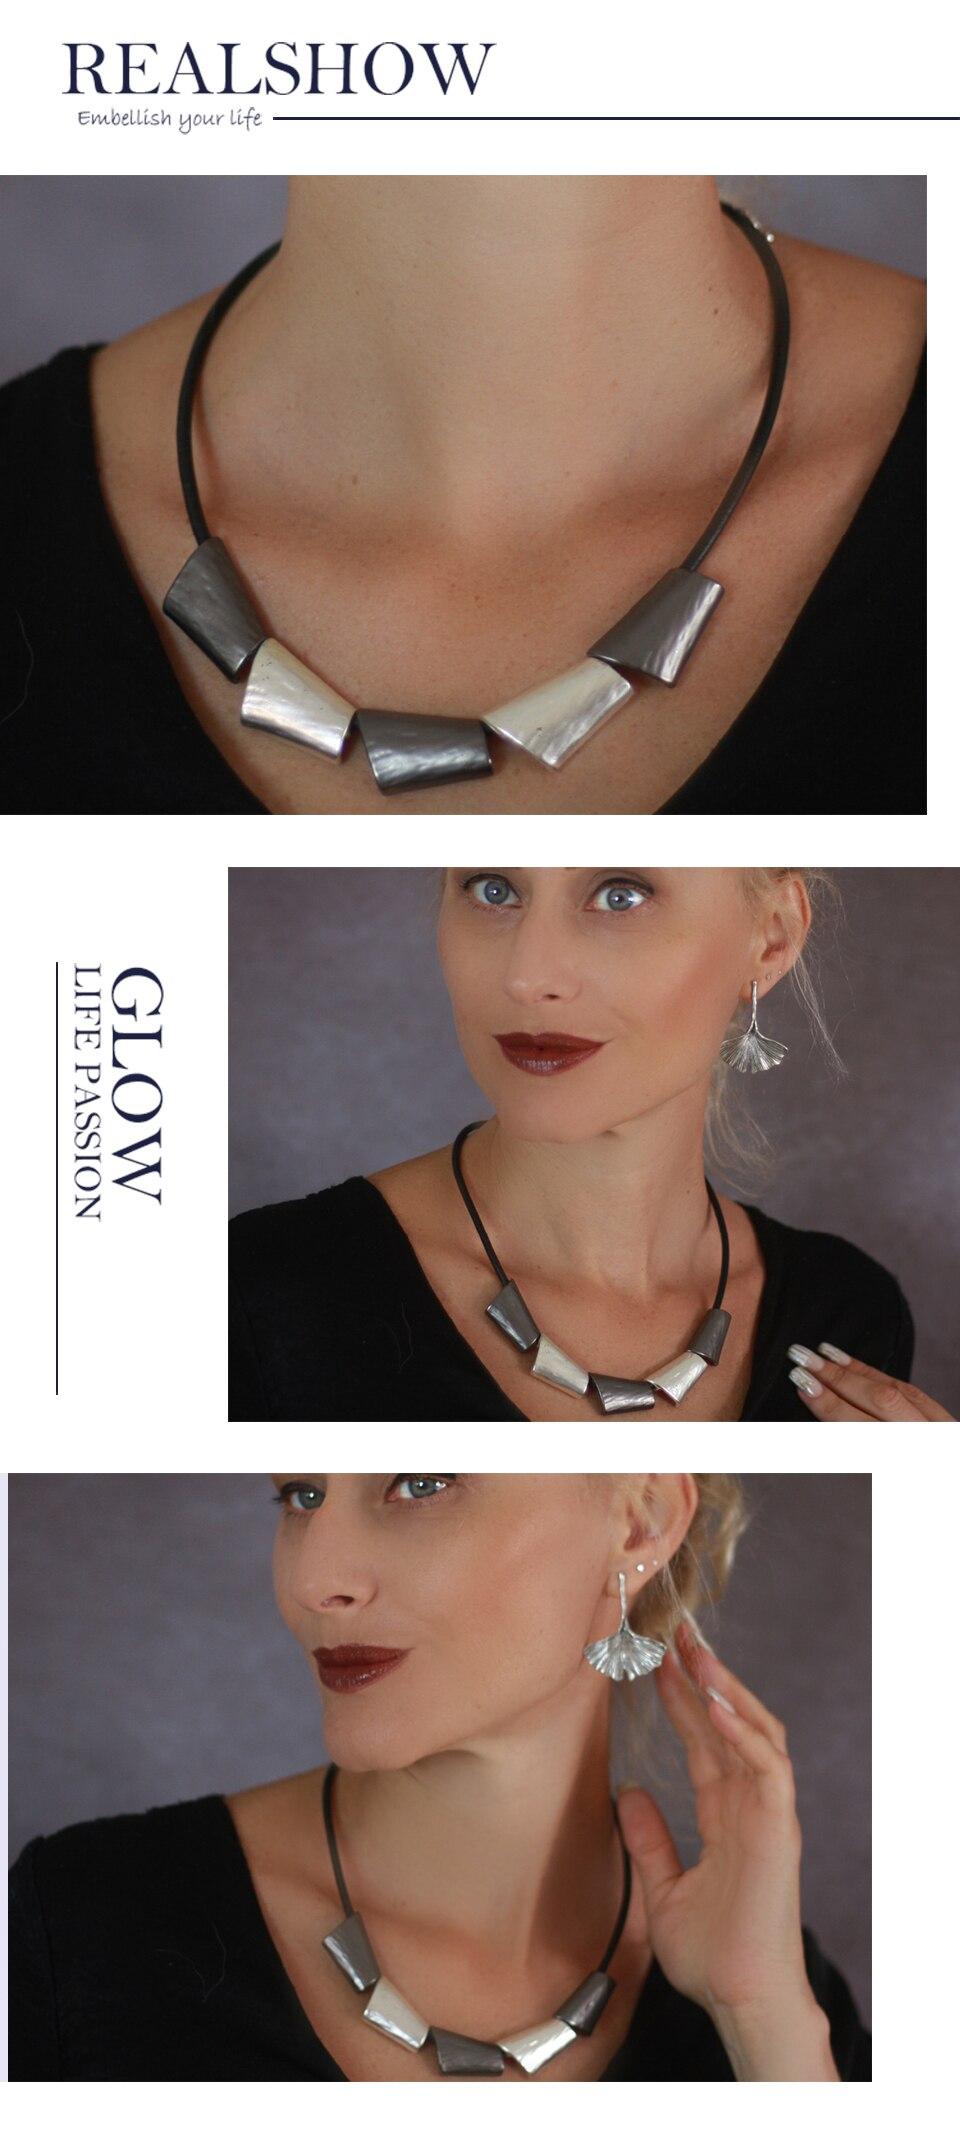 Adjustable Metal Necklaces Zinc Alloy Statement Necklace Choker Vintage Jewelry Pendant For Men Chain Collar Suspension Necklace